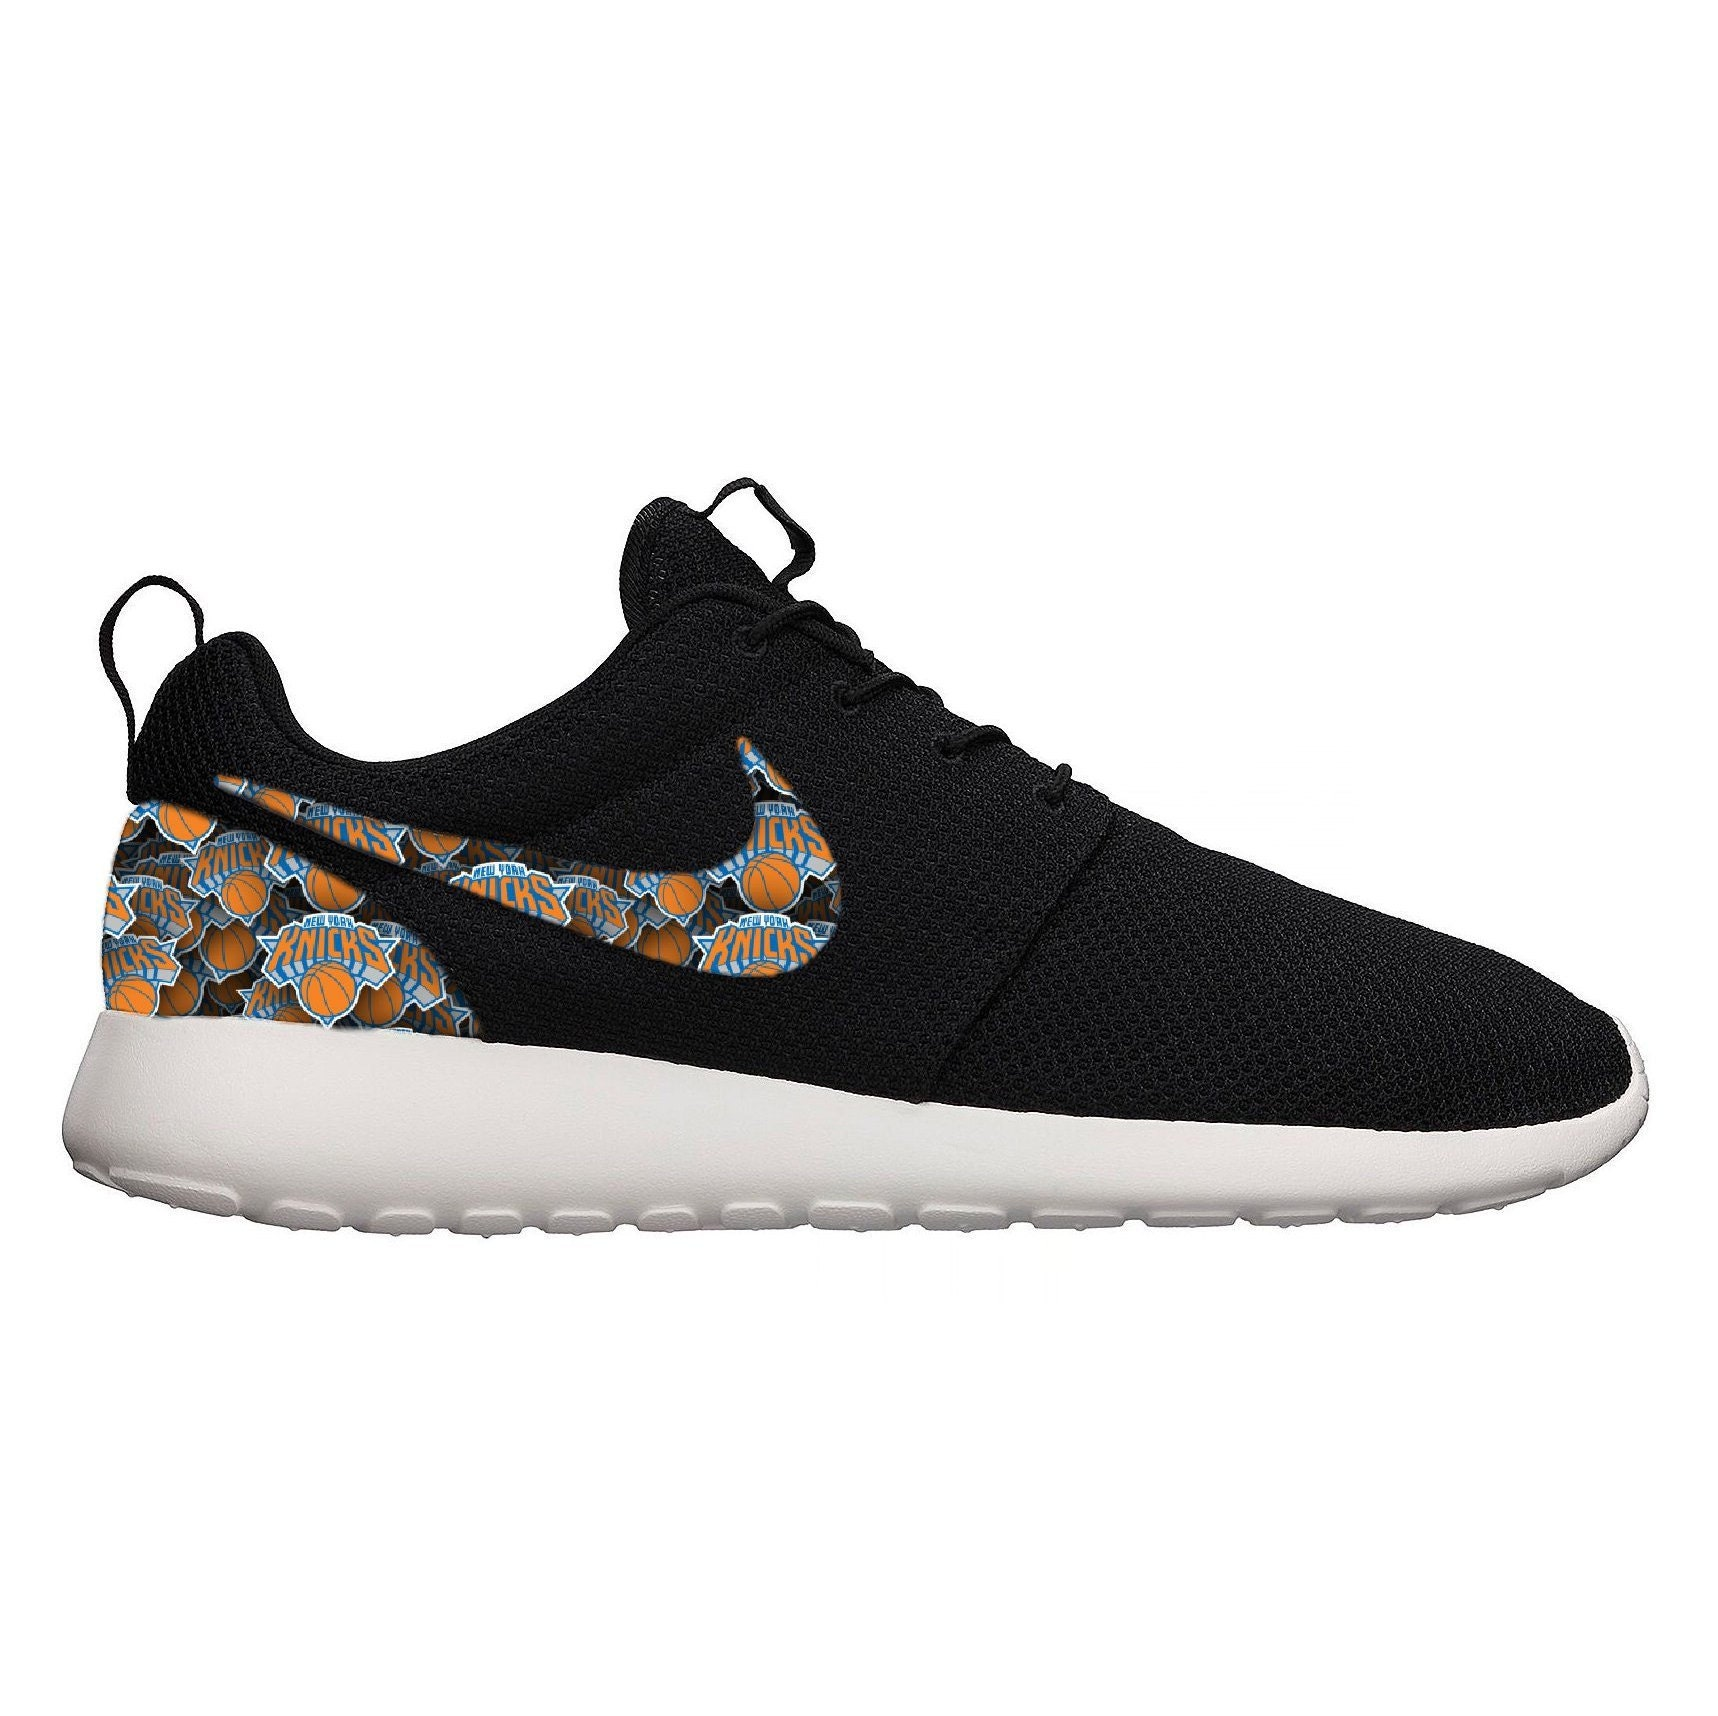 low priced 14e0f d57e0 New York Knicks NY NBA Custom Black Nike Roshe Run Sneakers   Etsy